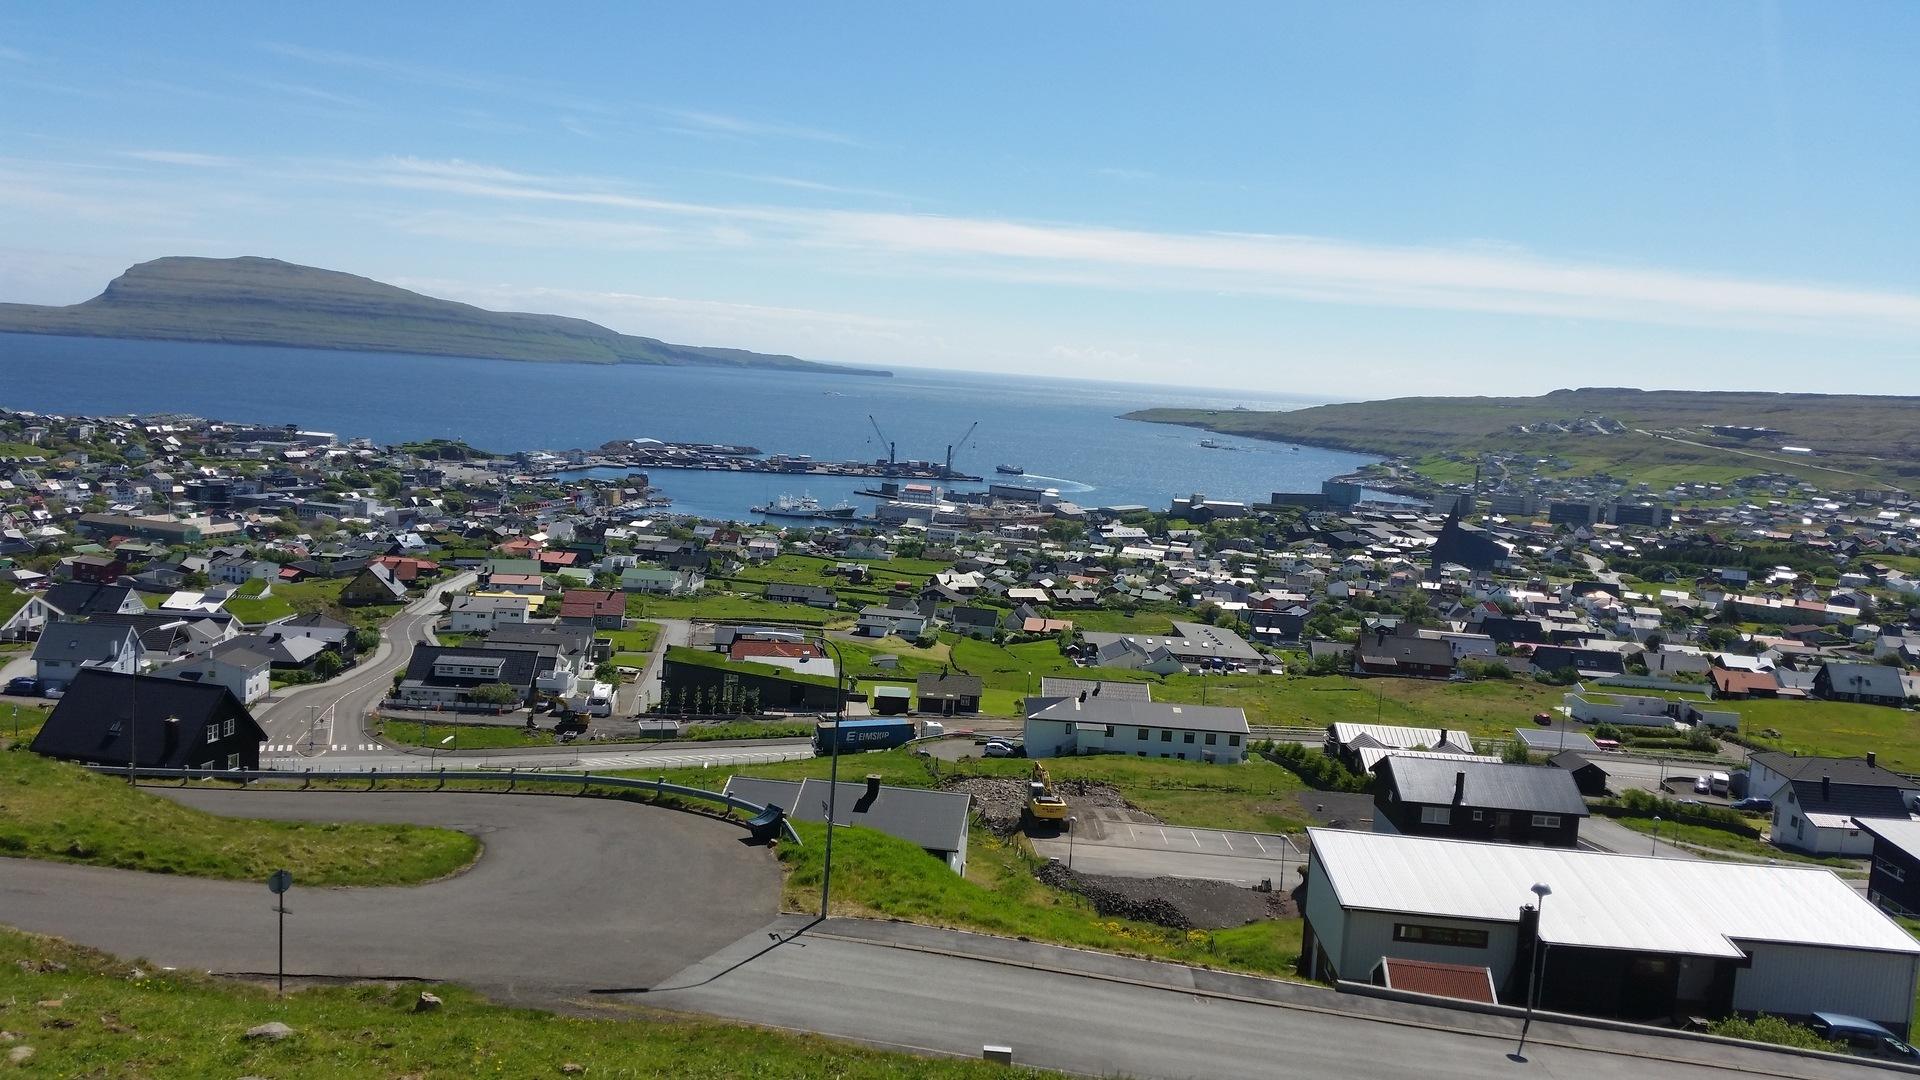 15 juin : visite de Torshavn